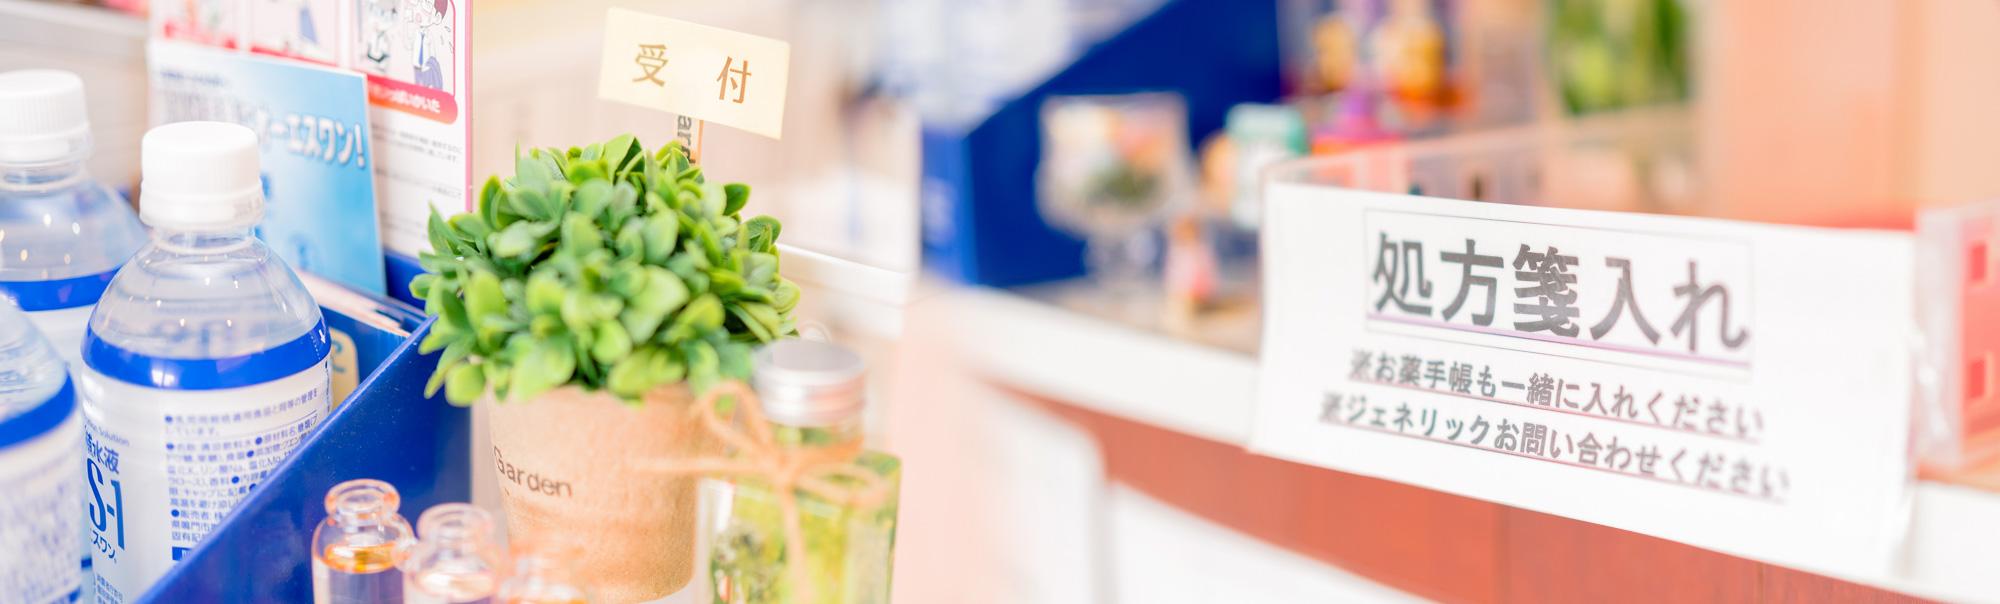 店舗紹介|八王子・日野の調剤は開晴薬局